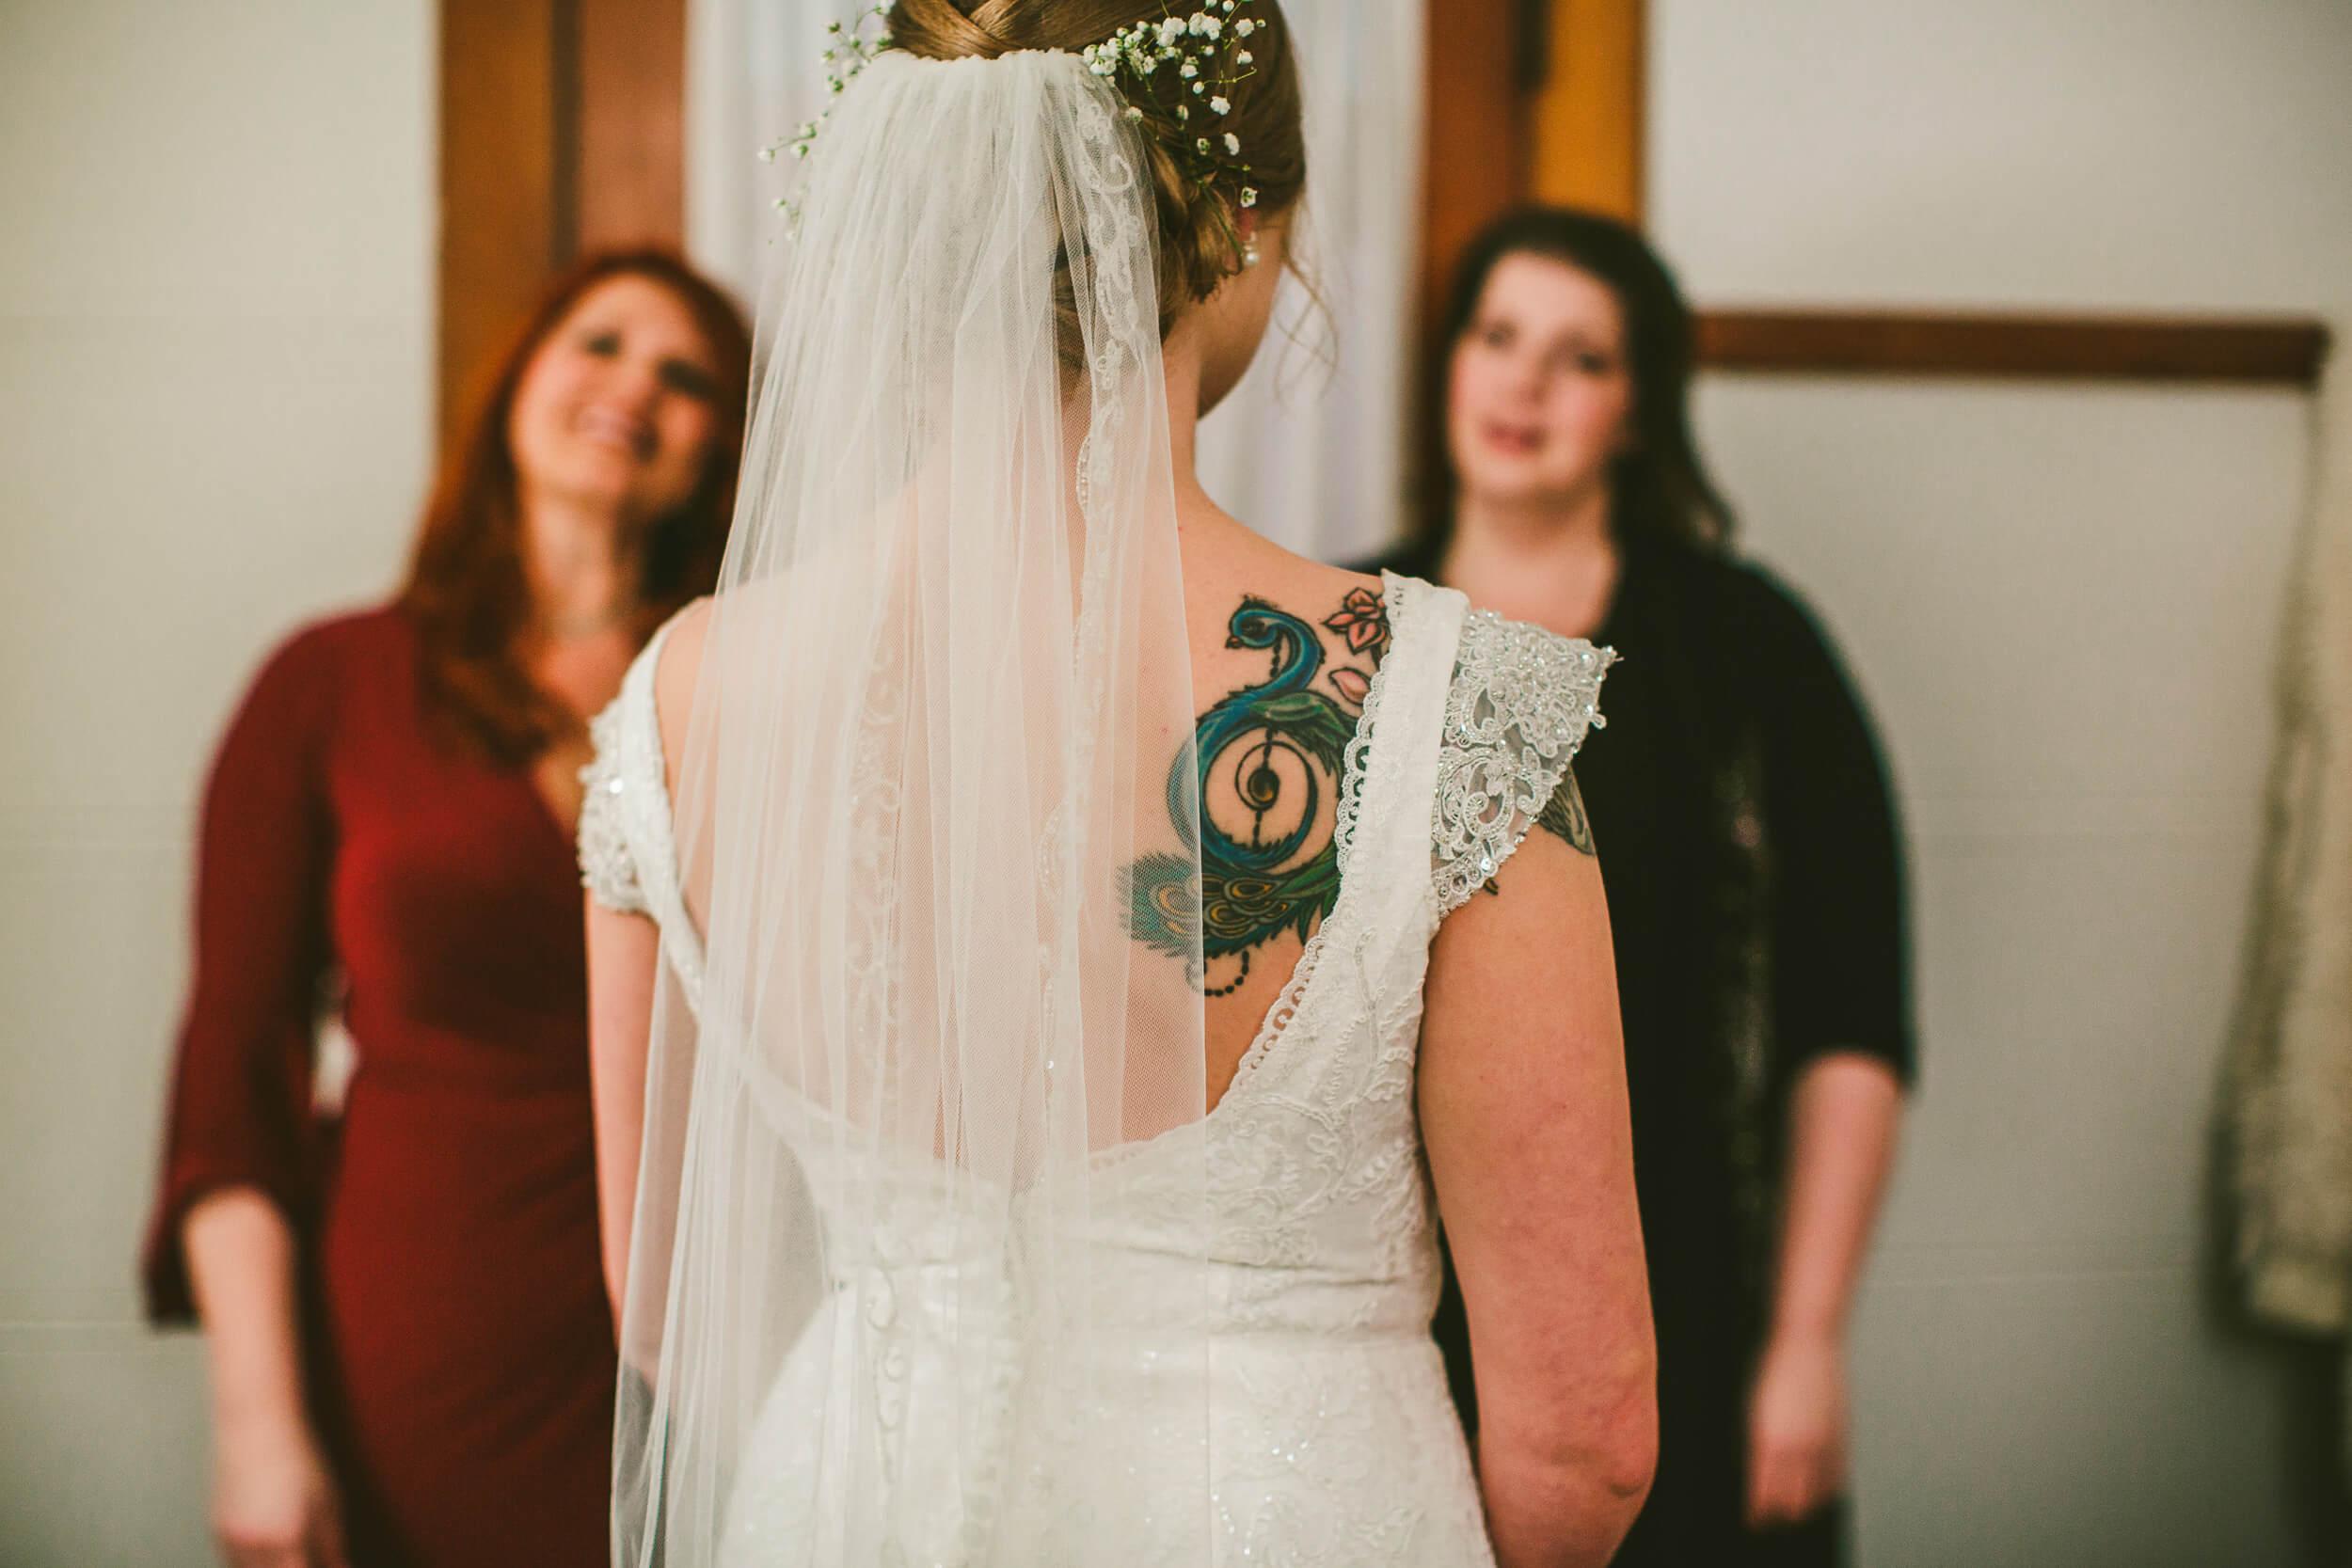 mukogawa winter wedding in spokane (47).jpg